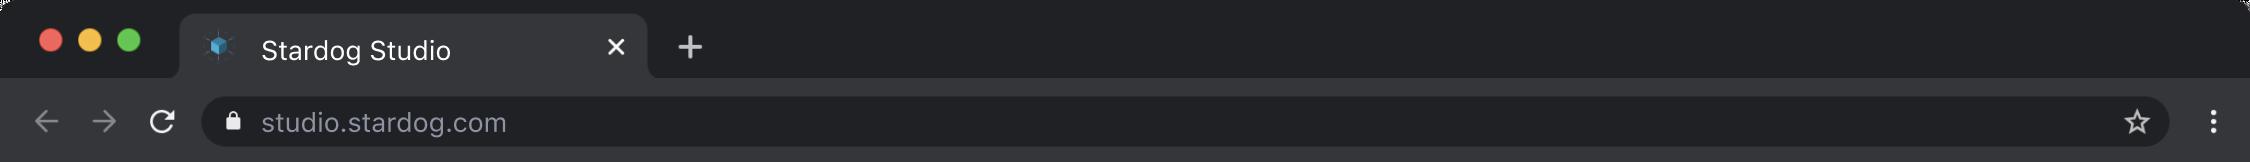 studio browser tab